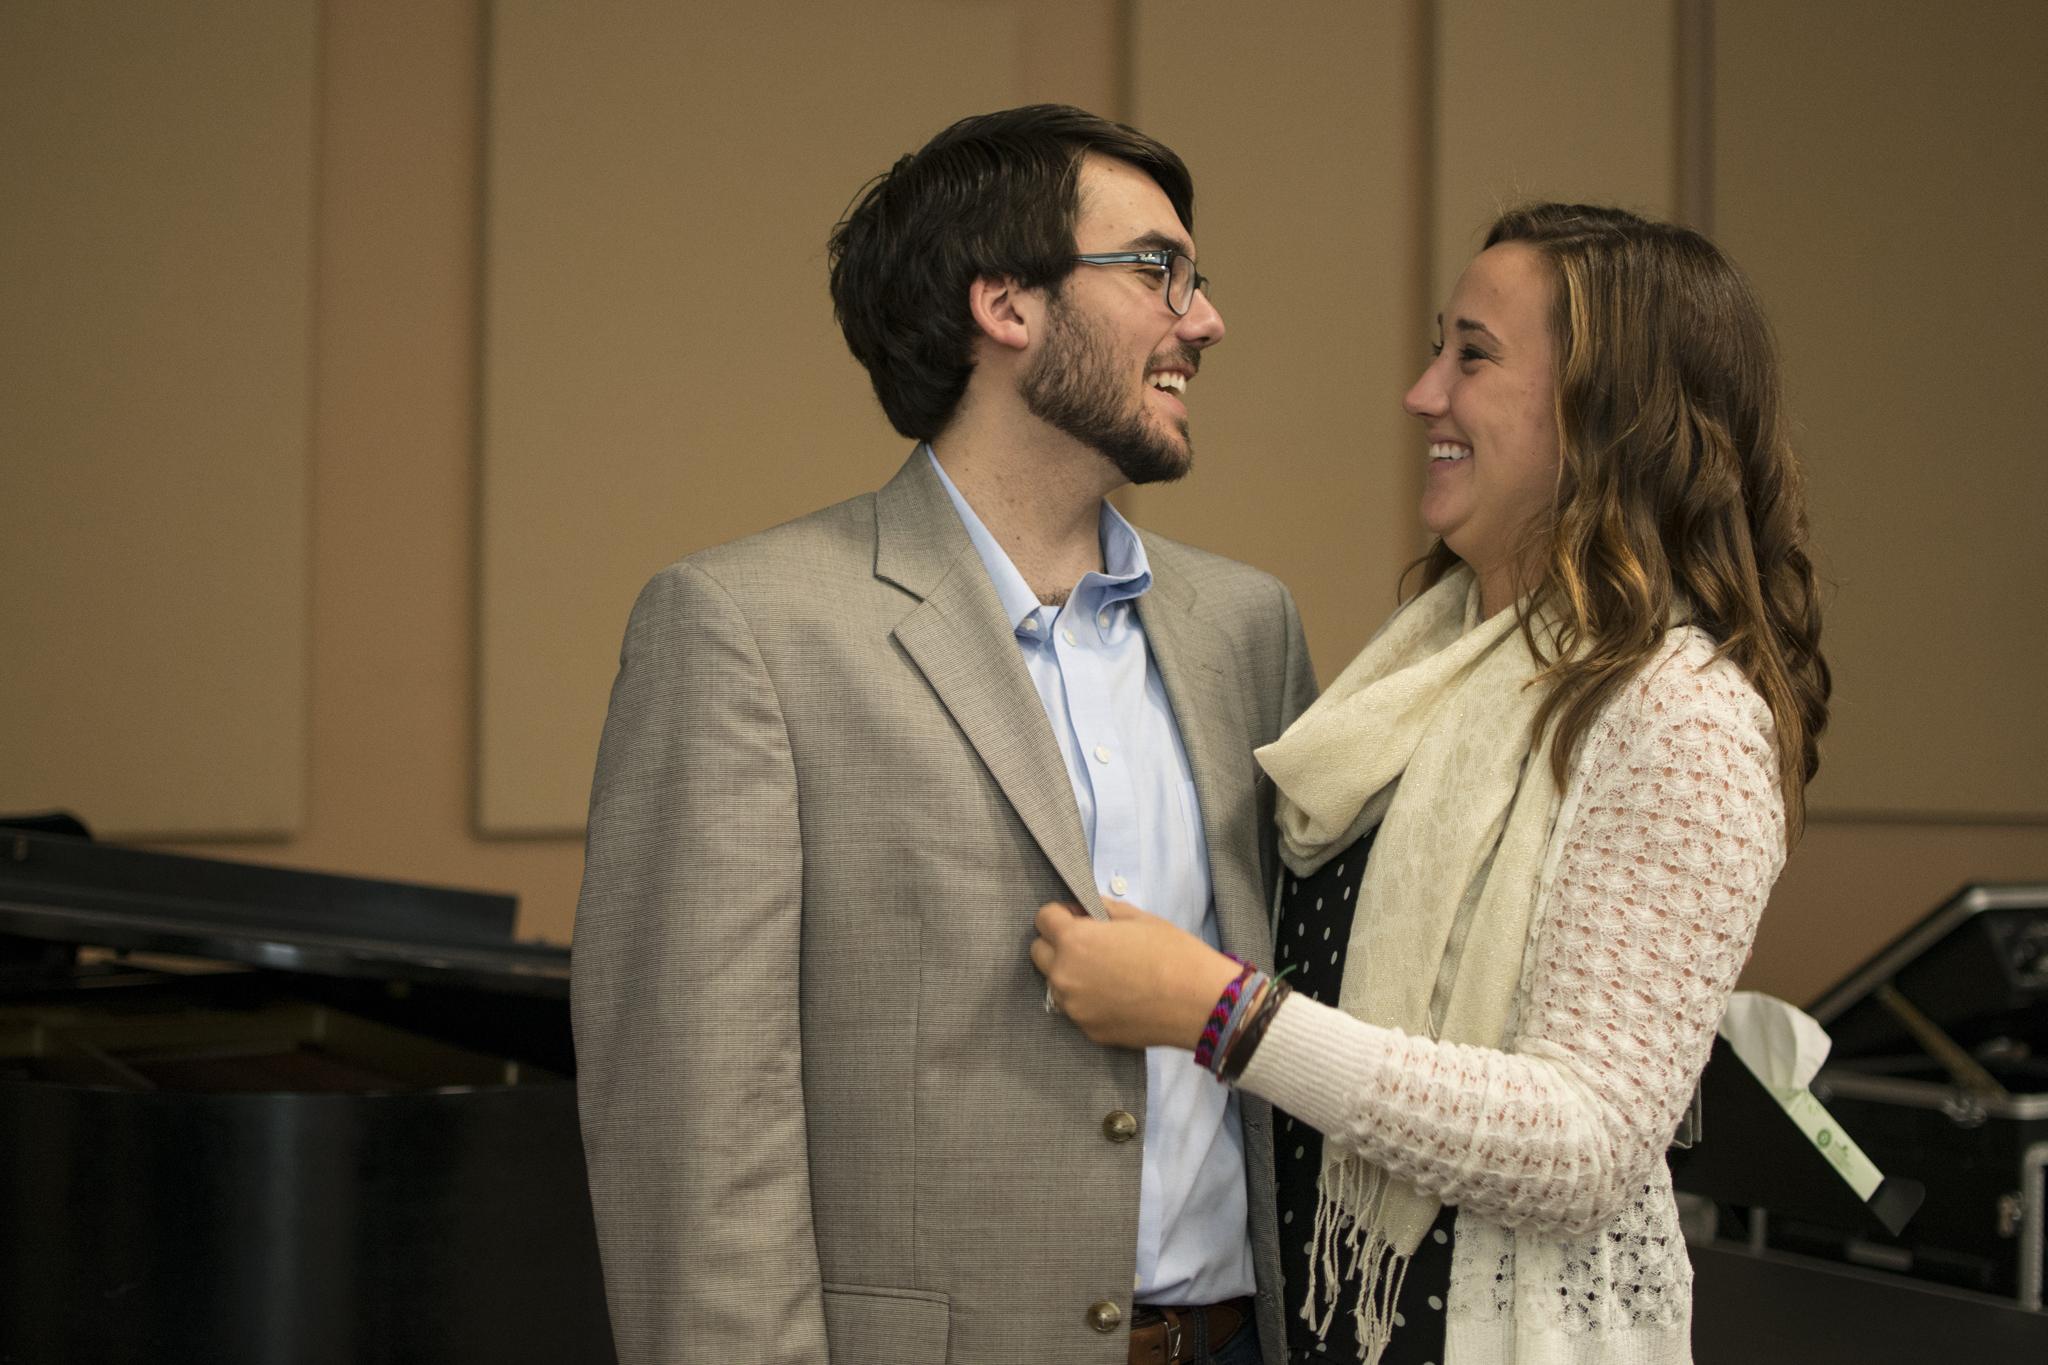 proposal at liberty baptist church in hampton, virginia